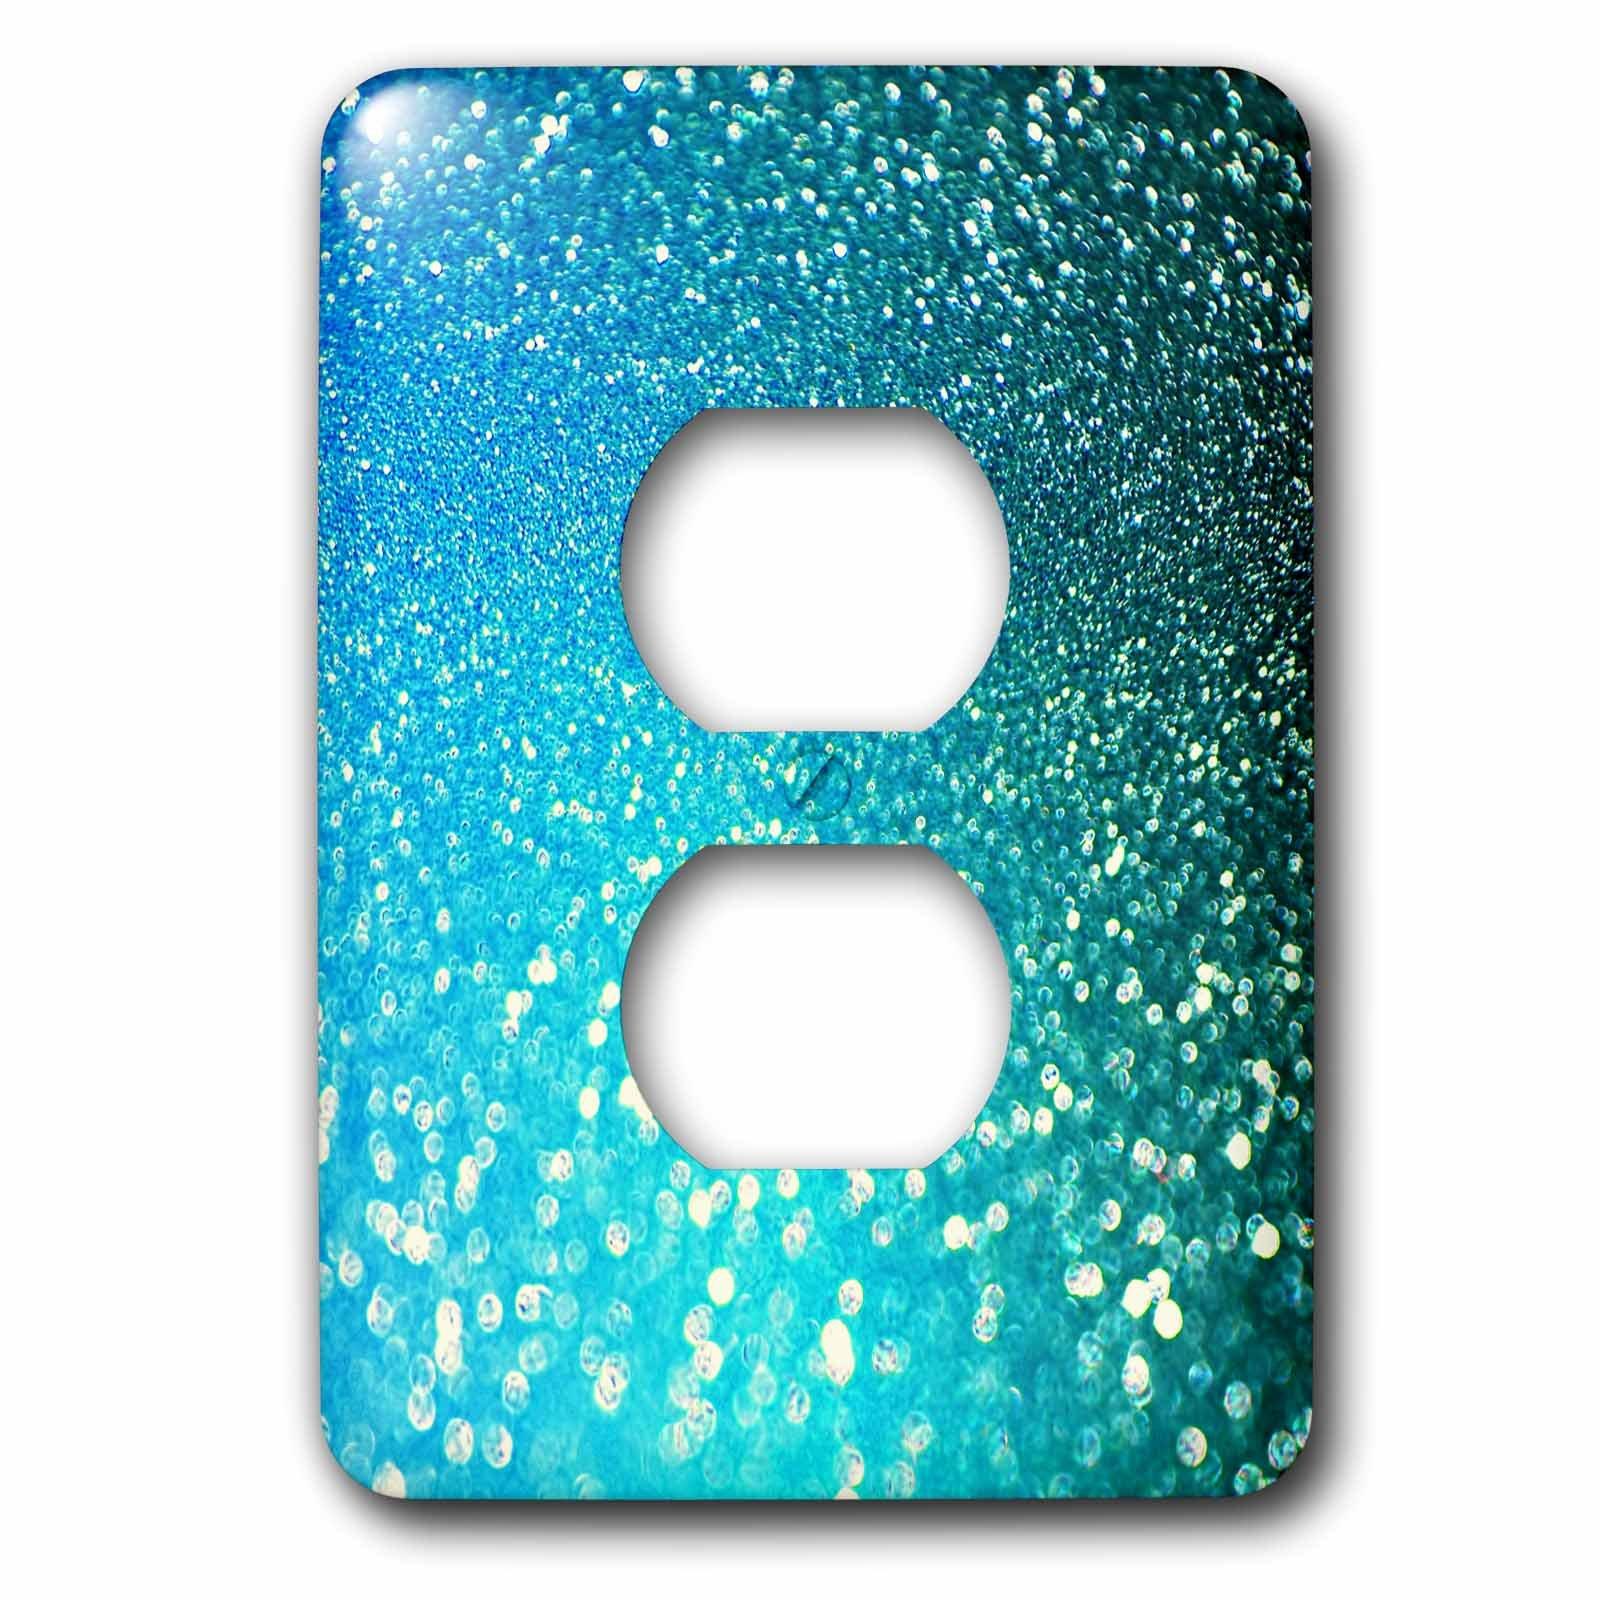 3dRose Uta Naumann Faux Glitter Pattern - Sparkling Beach Blue Luxury Elegant Mermaid Glitter Effect Art print - Light Switch Covers - 2 plug outlet cover (lsp_266918_6)